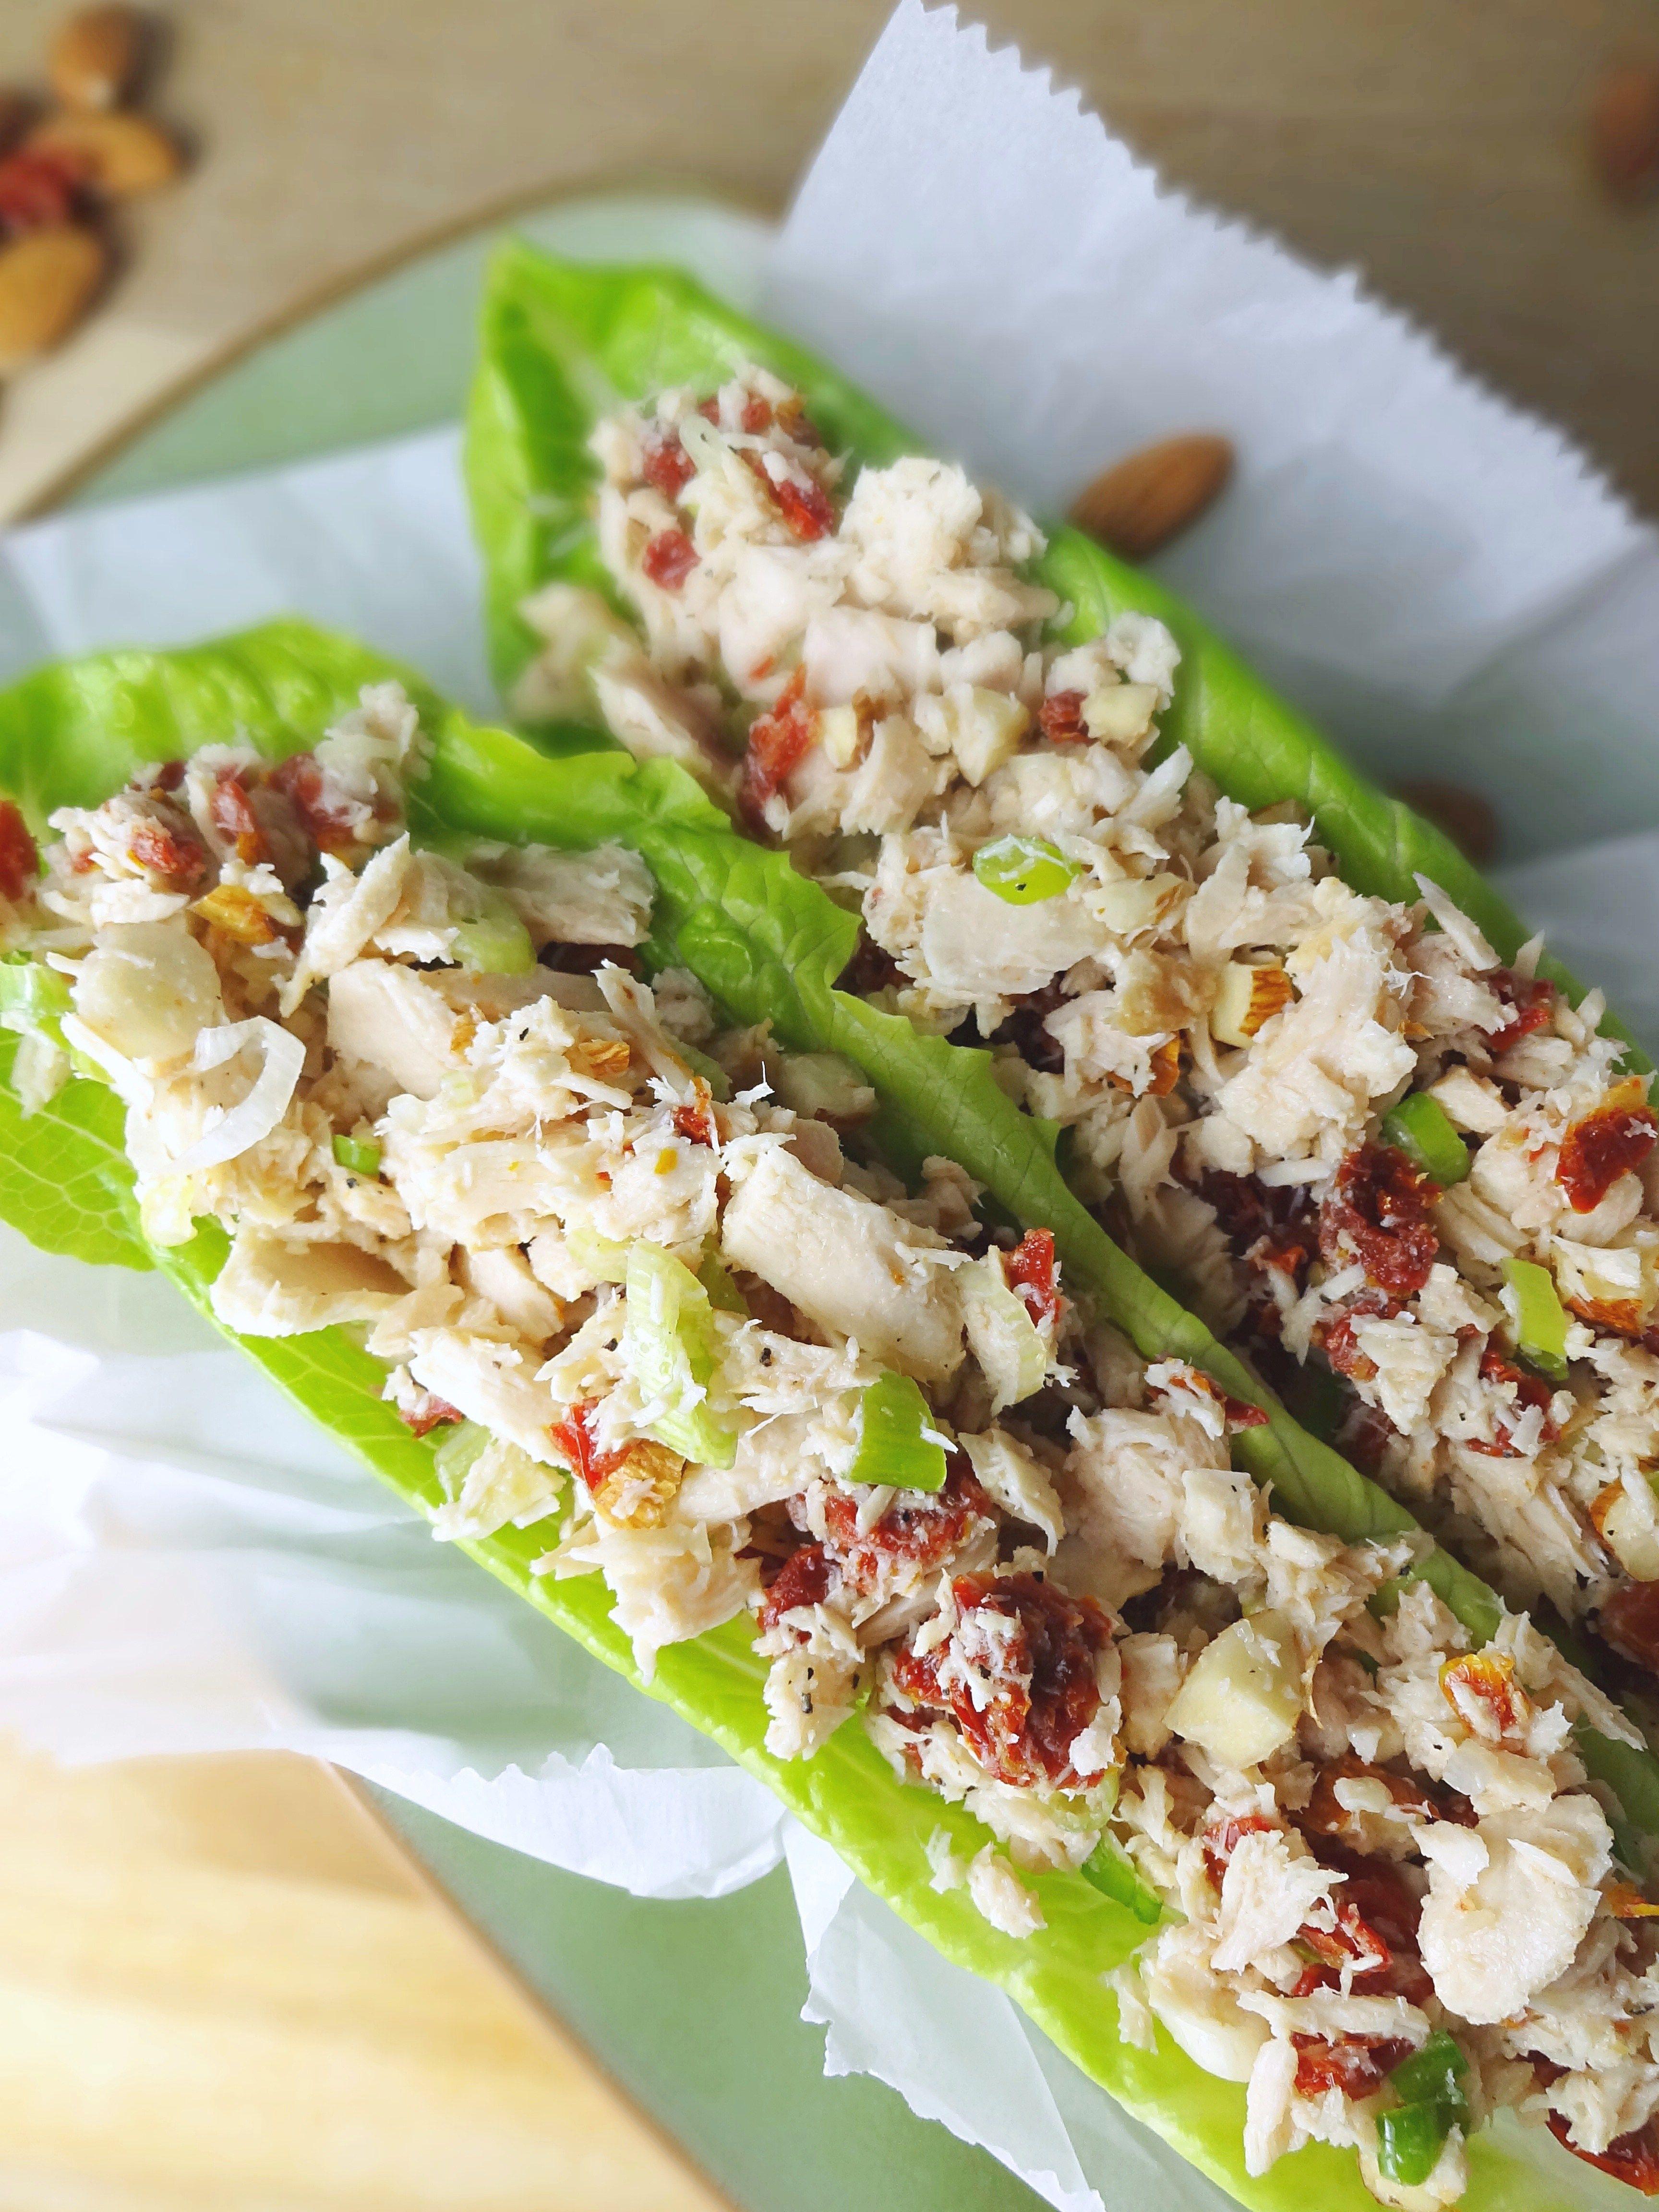 Artichoke and Ripe-Olive Tuna Salad Artichoke and Ripe-Olive Tuna Salad new picture